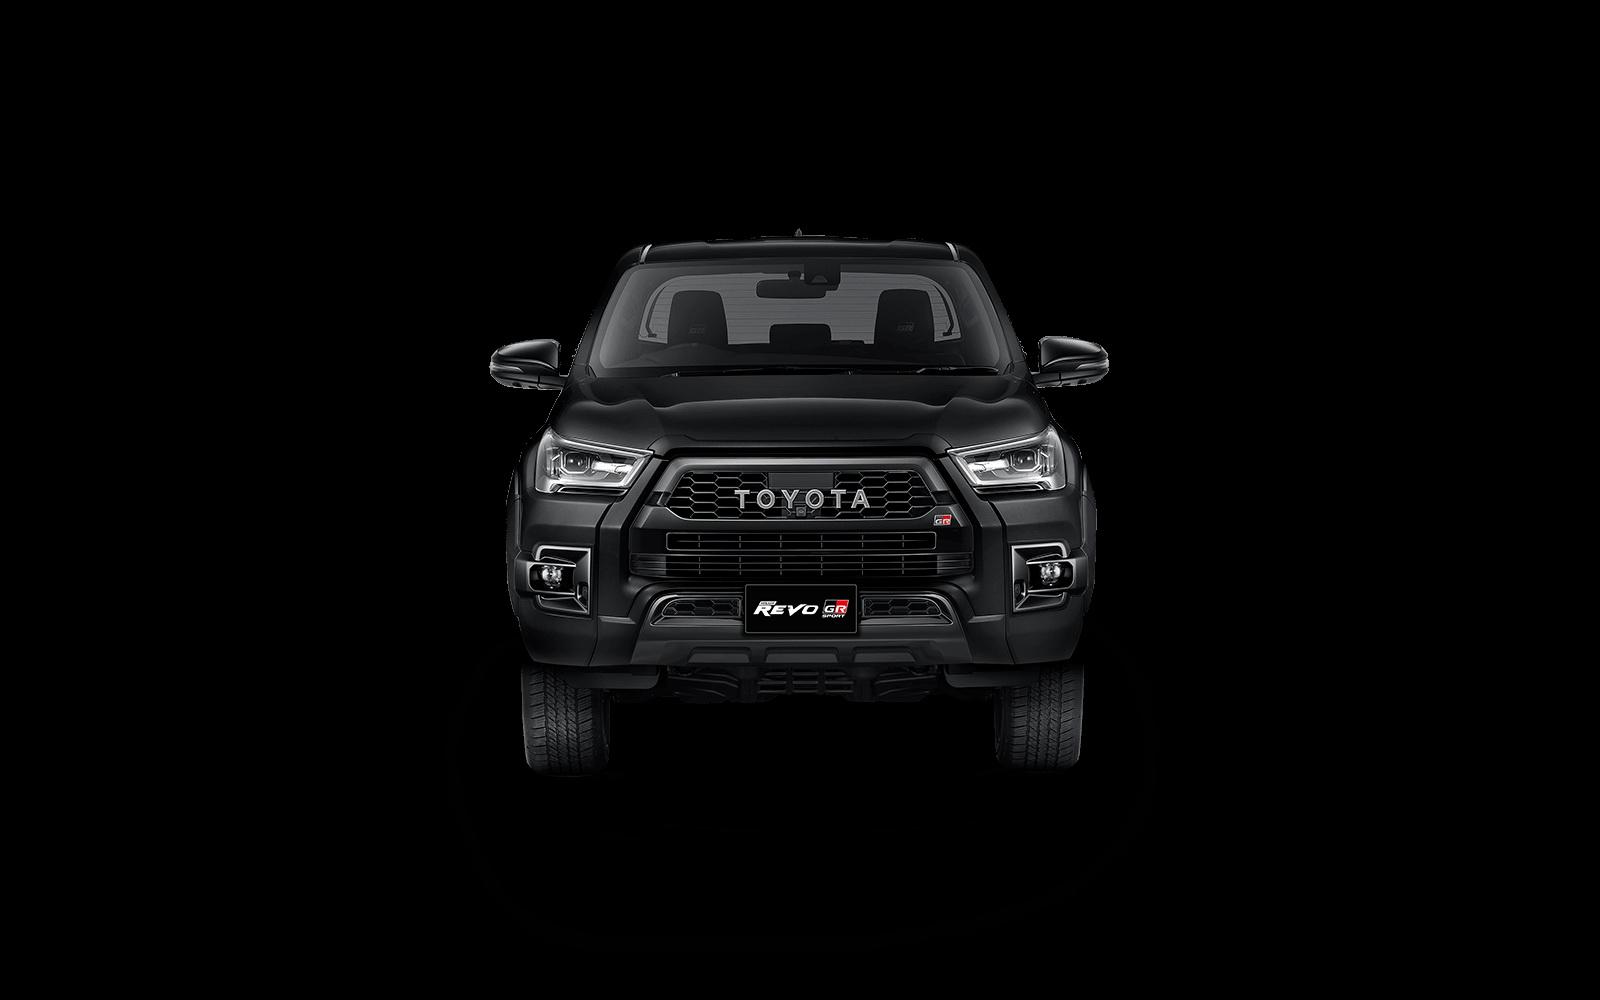 Toyota-Hilux-Revo-GR-Sport-22